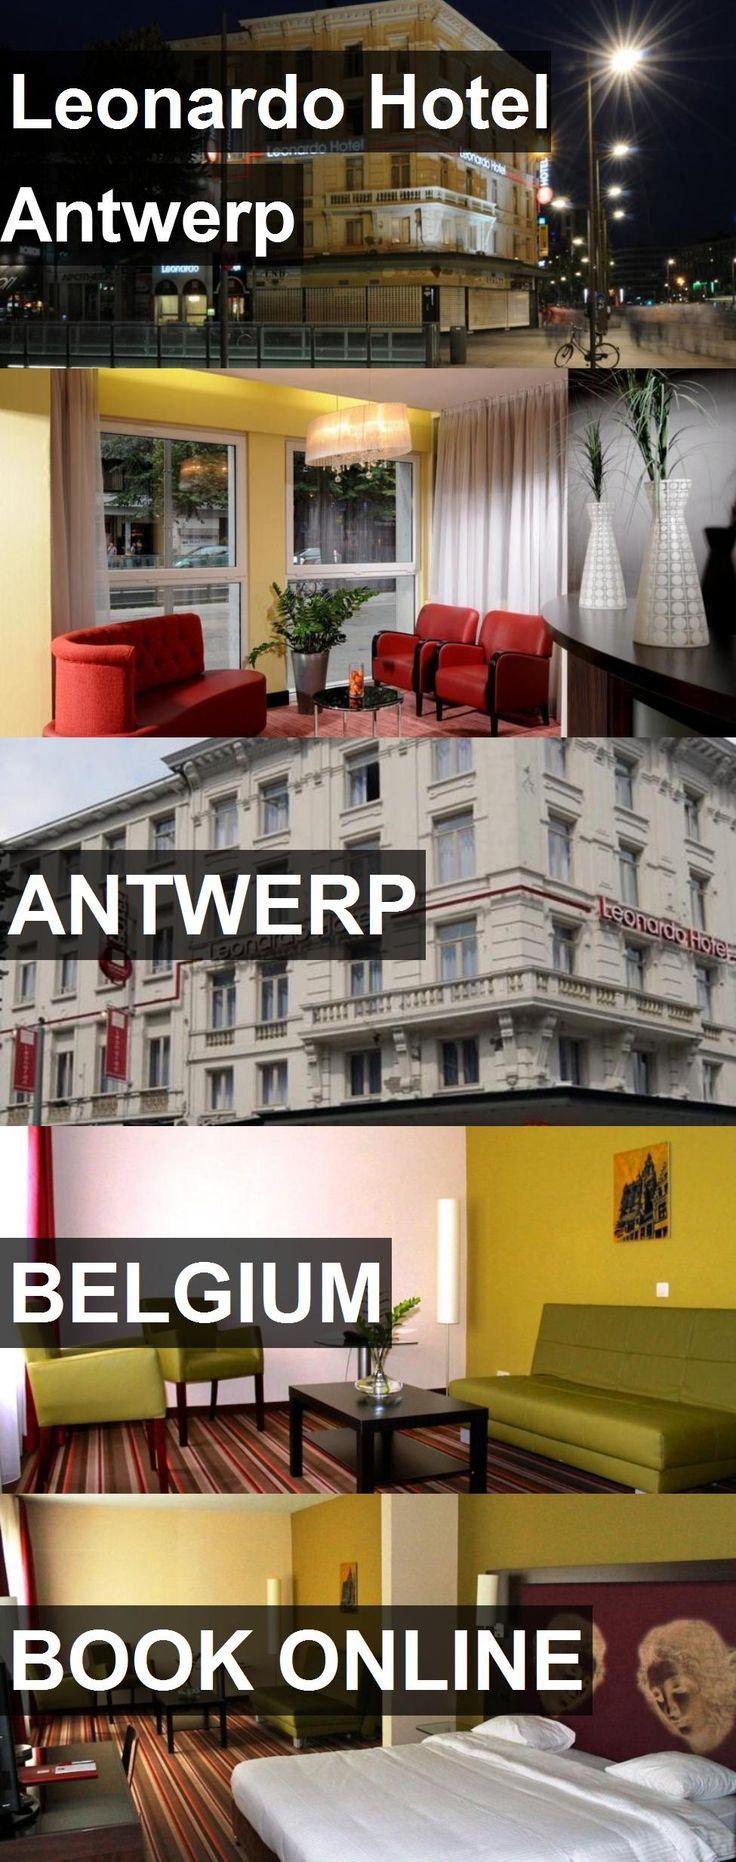 Hotel Leonardo Hotel Antwerp in Antwerp, Belgium. For more information, photos, reviews and best prices please follow the link. #Belgium #Antwerp #LeonardoHotelAntwerp #hotel #travel #vacation